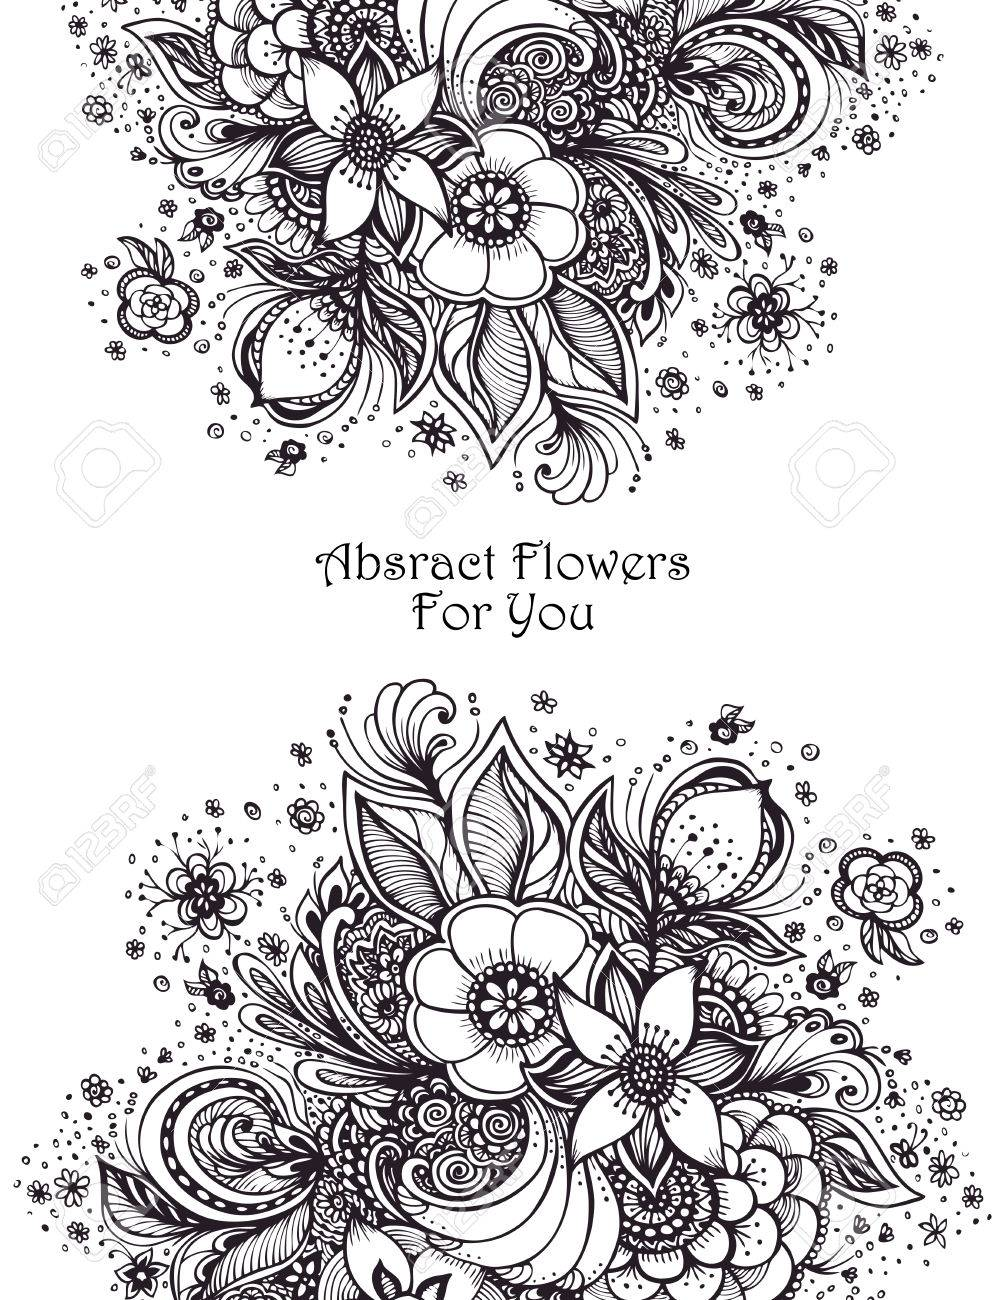 Plantilla Con Flores Abstractas Ramo Negro Sobre Blanco Para ...